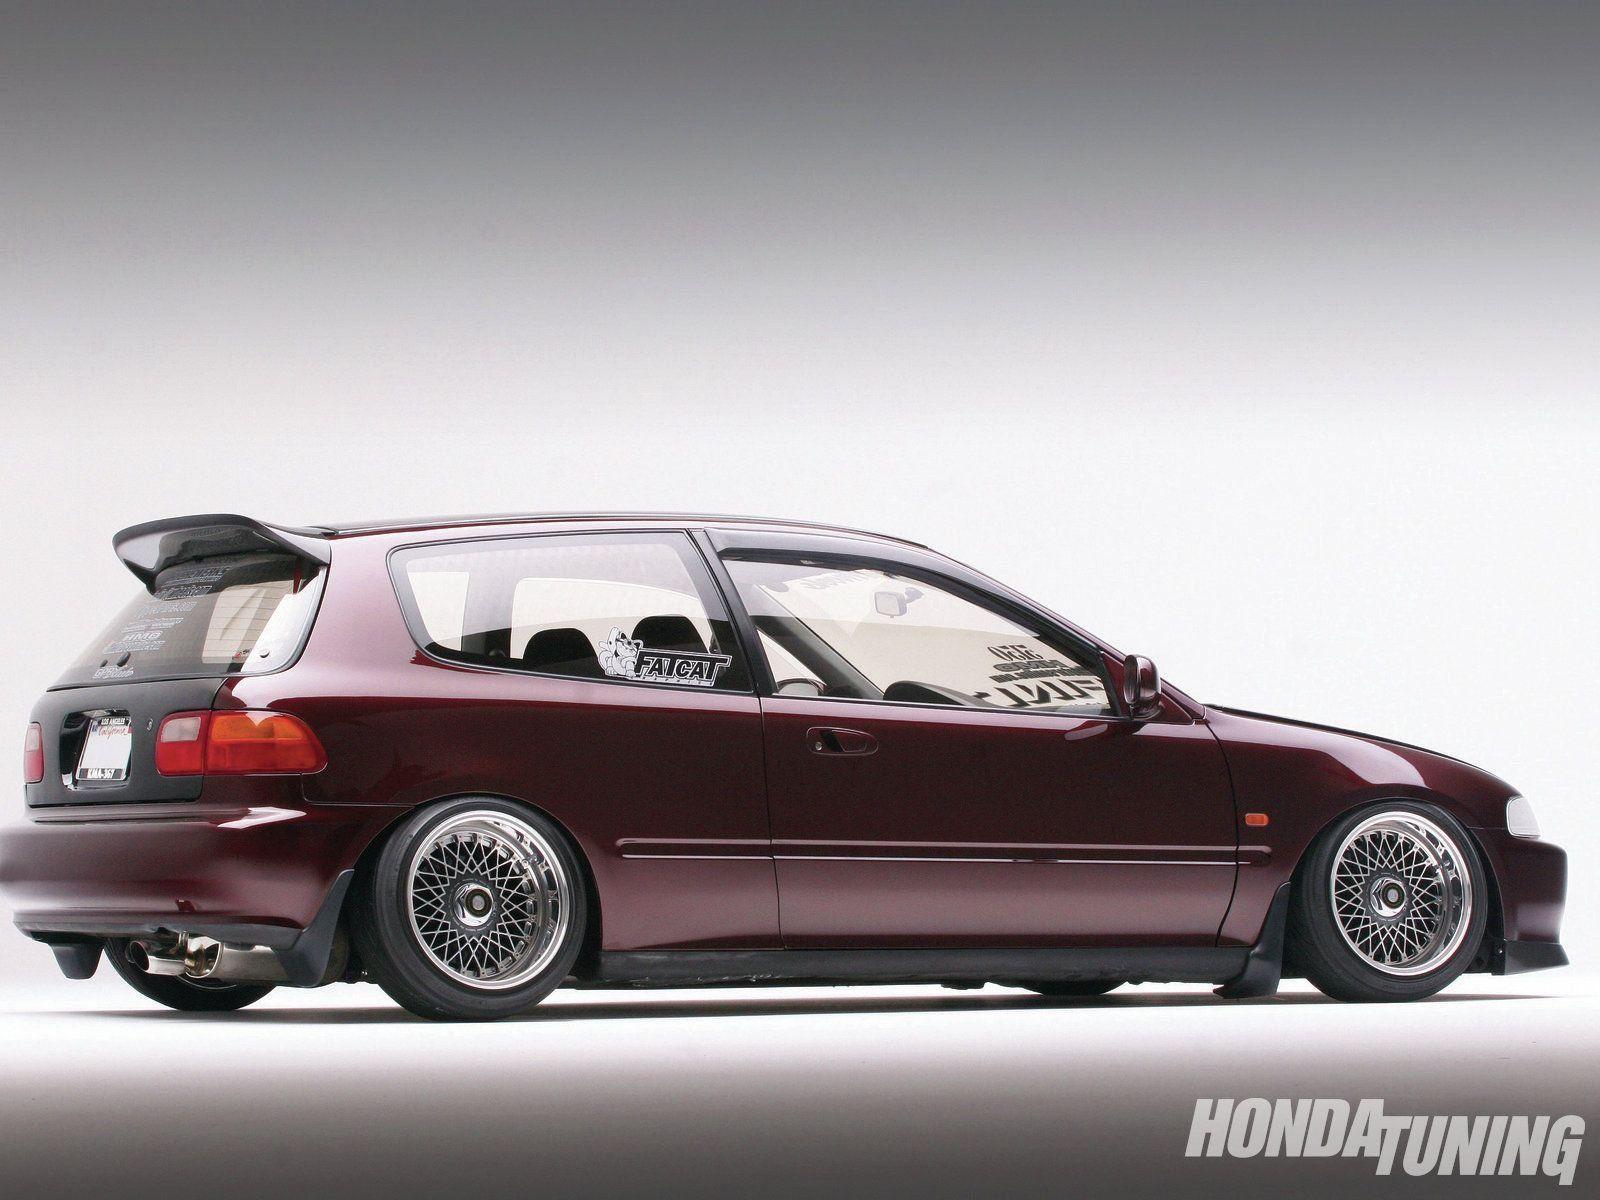 Honda Civic Type R Coupe Tuning 1 Honda Civic Hatchback Honda Civic Type R Honda